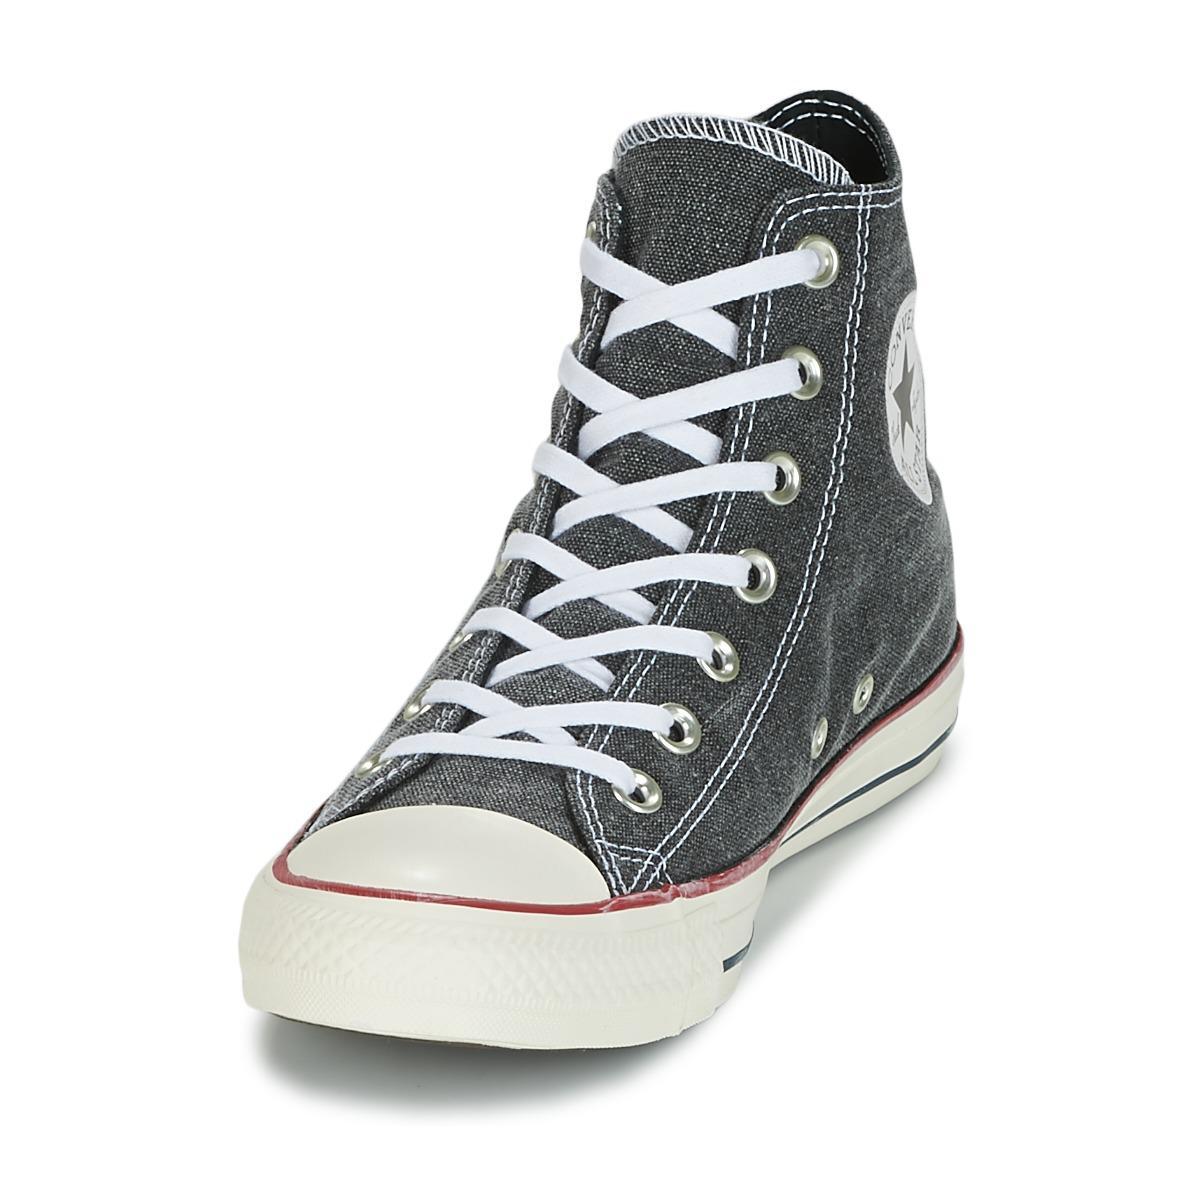 0d74c5038d7b Converse - Gray Chuck Taylor All Star Hi Stone Wash Women s Shoes (high-top.  View fullscreen